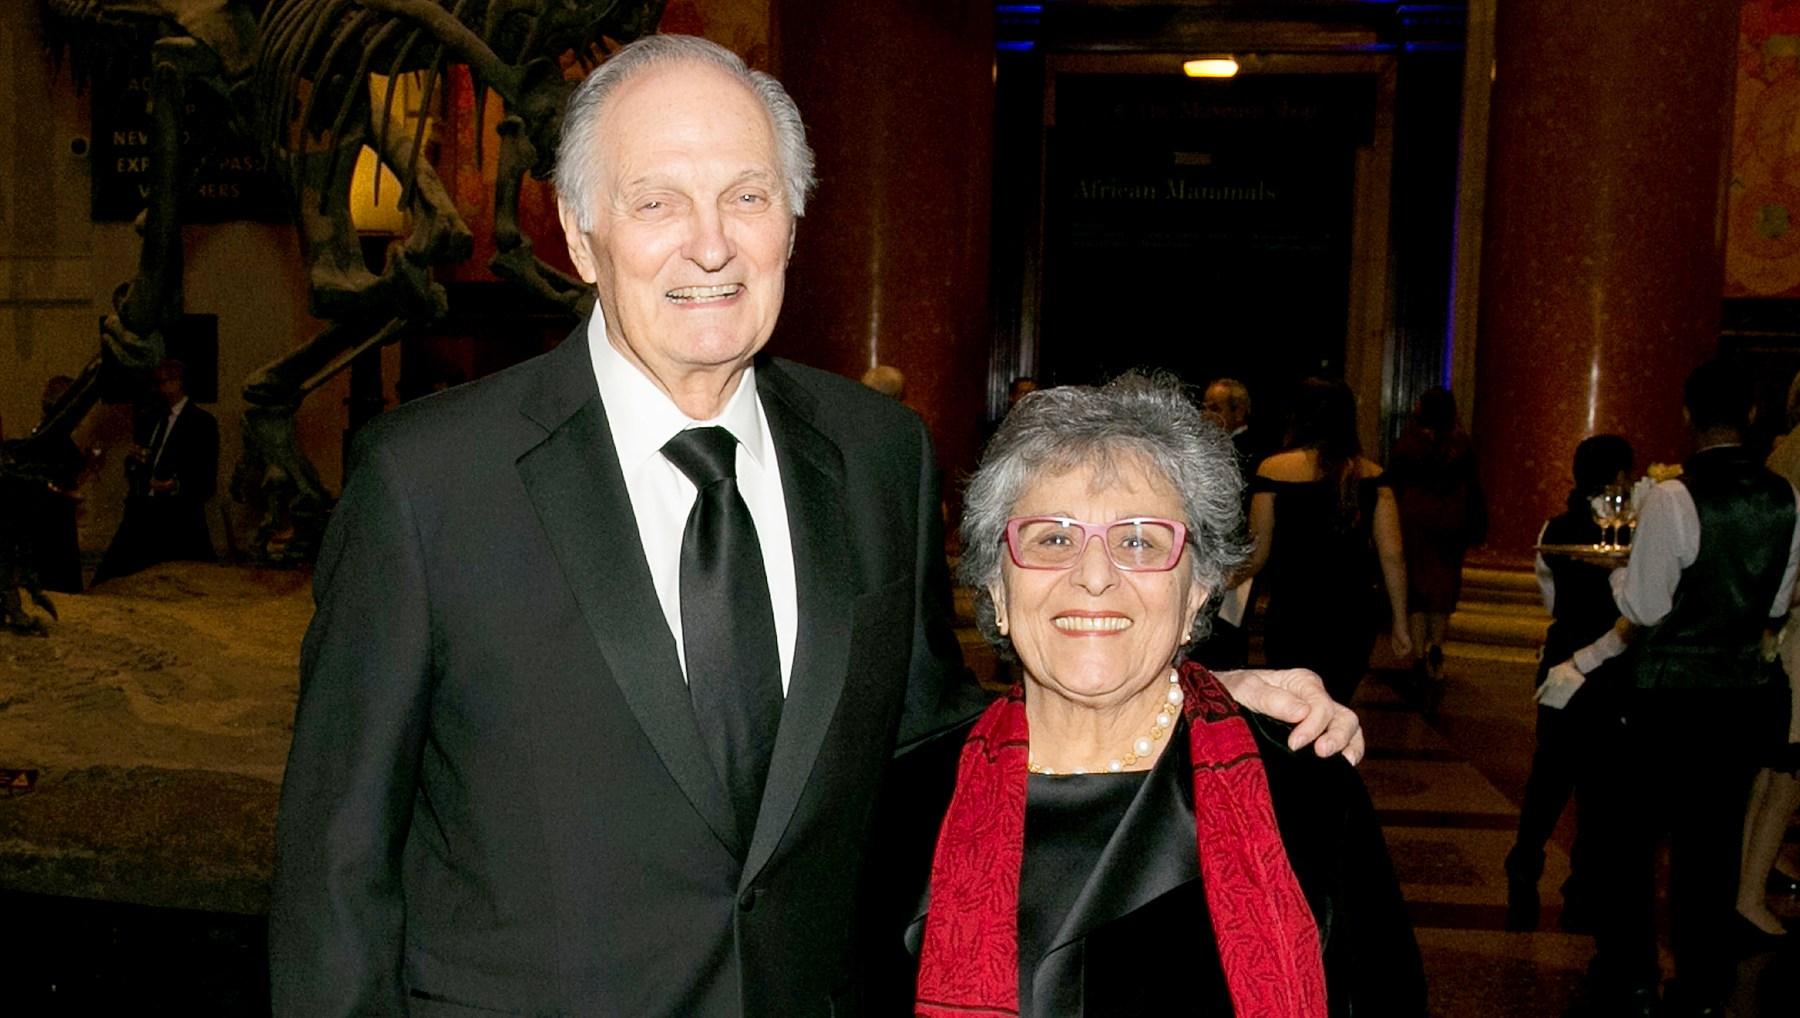 Alan Alda Reveals Clever Secret Behind His 61 Year Marriage